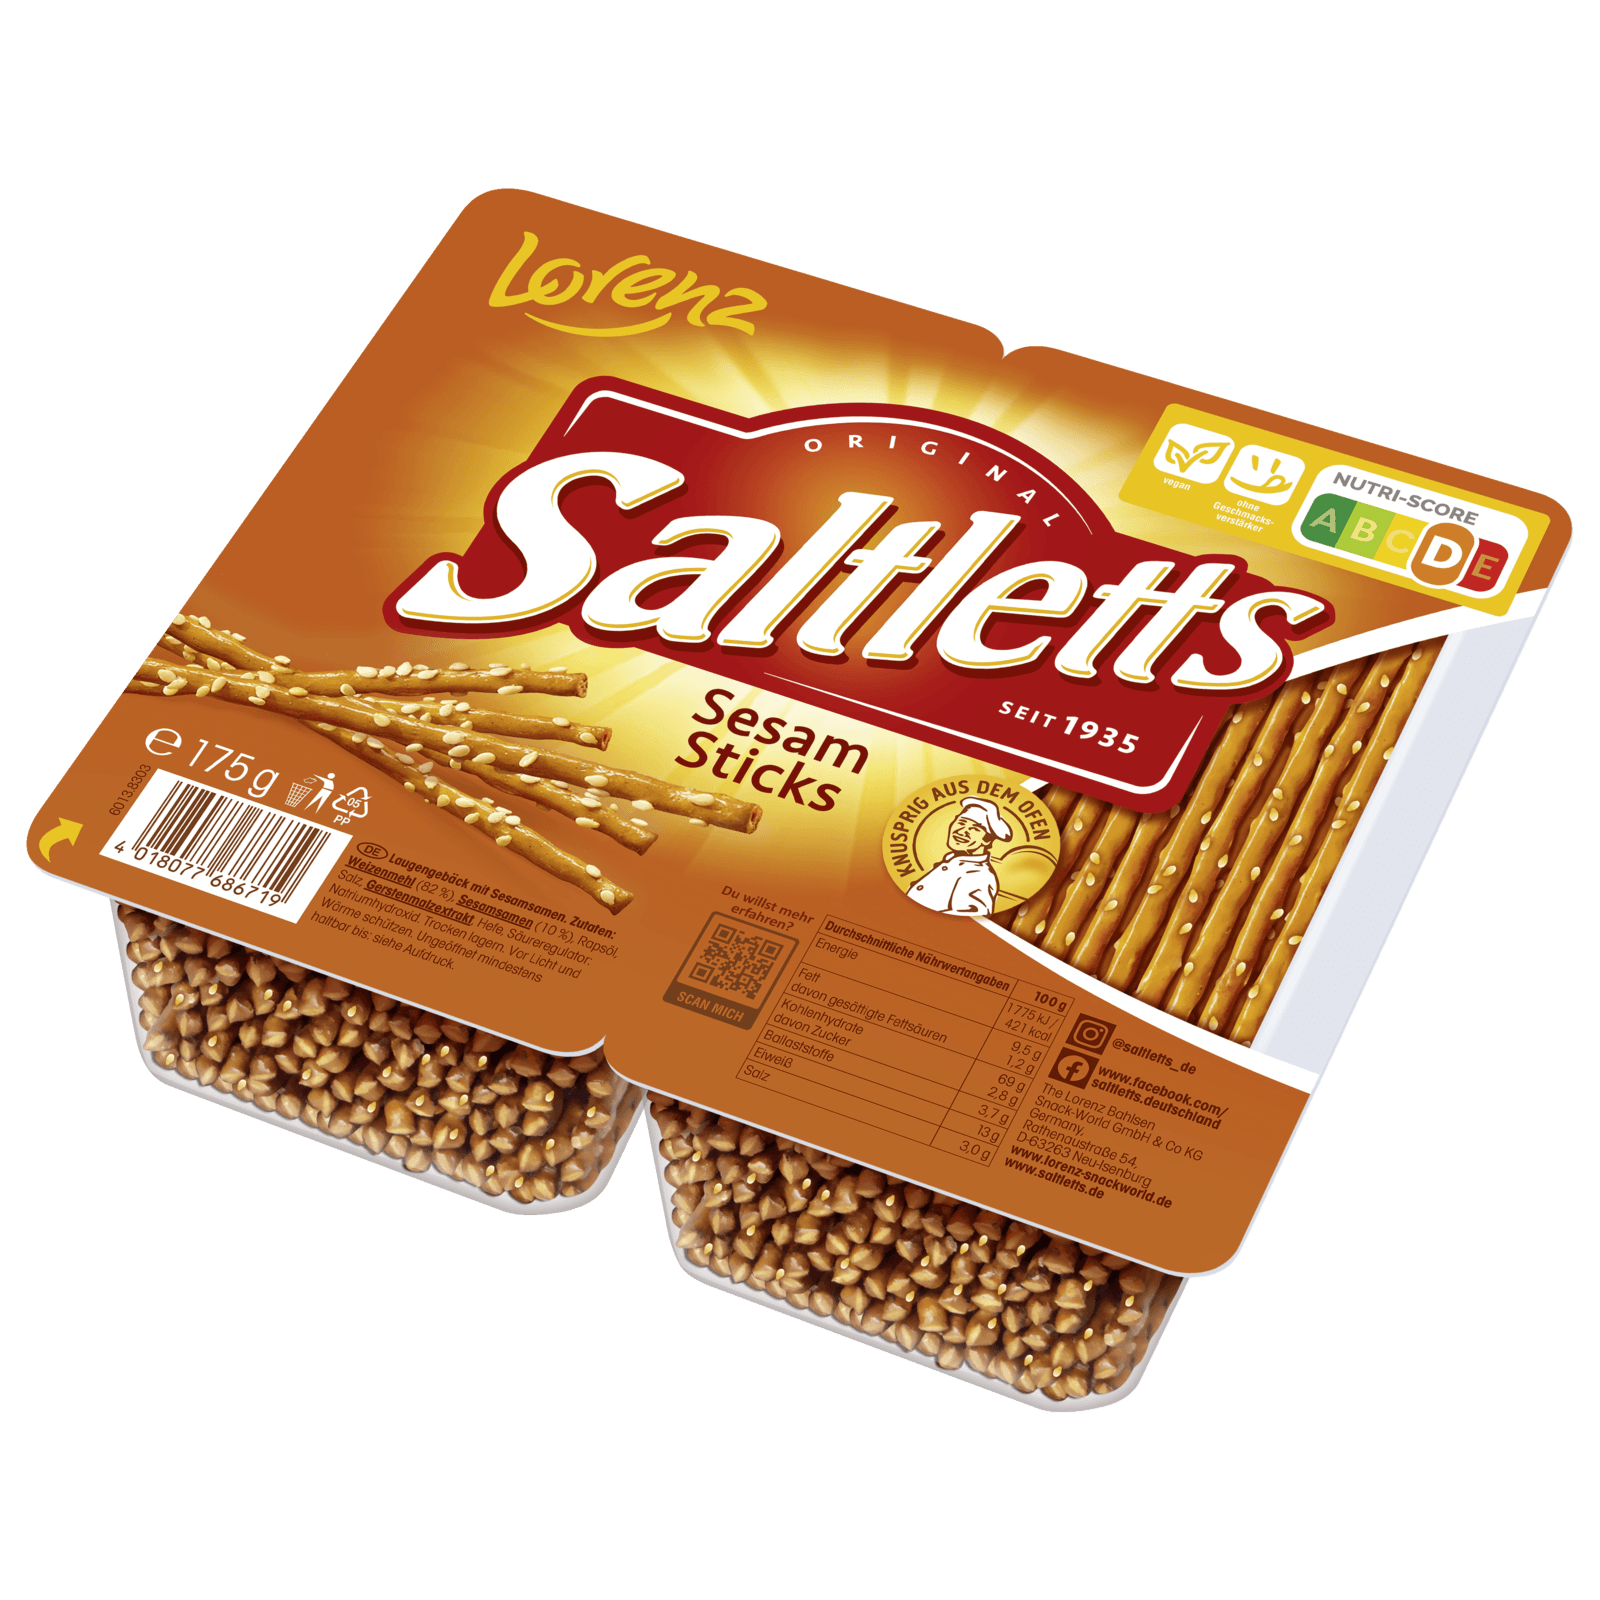 Lorenz Saltletts Sticks Sesam 175g